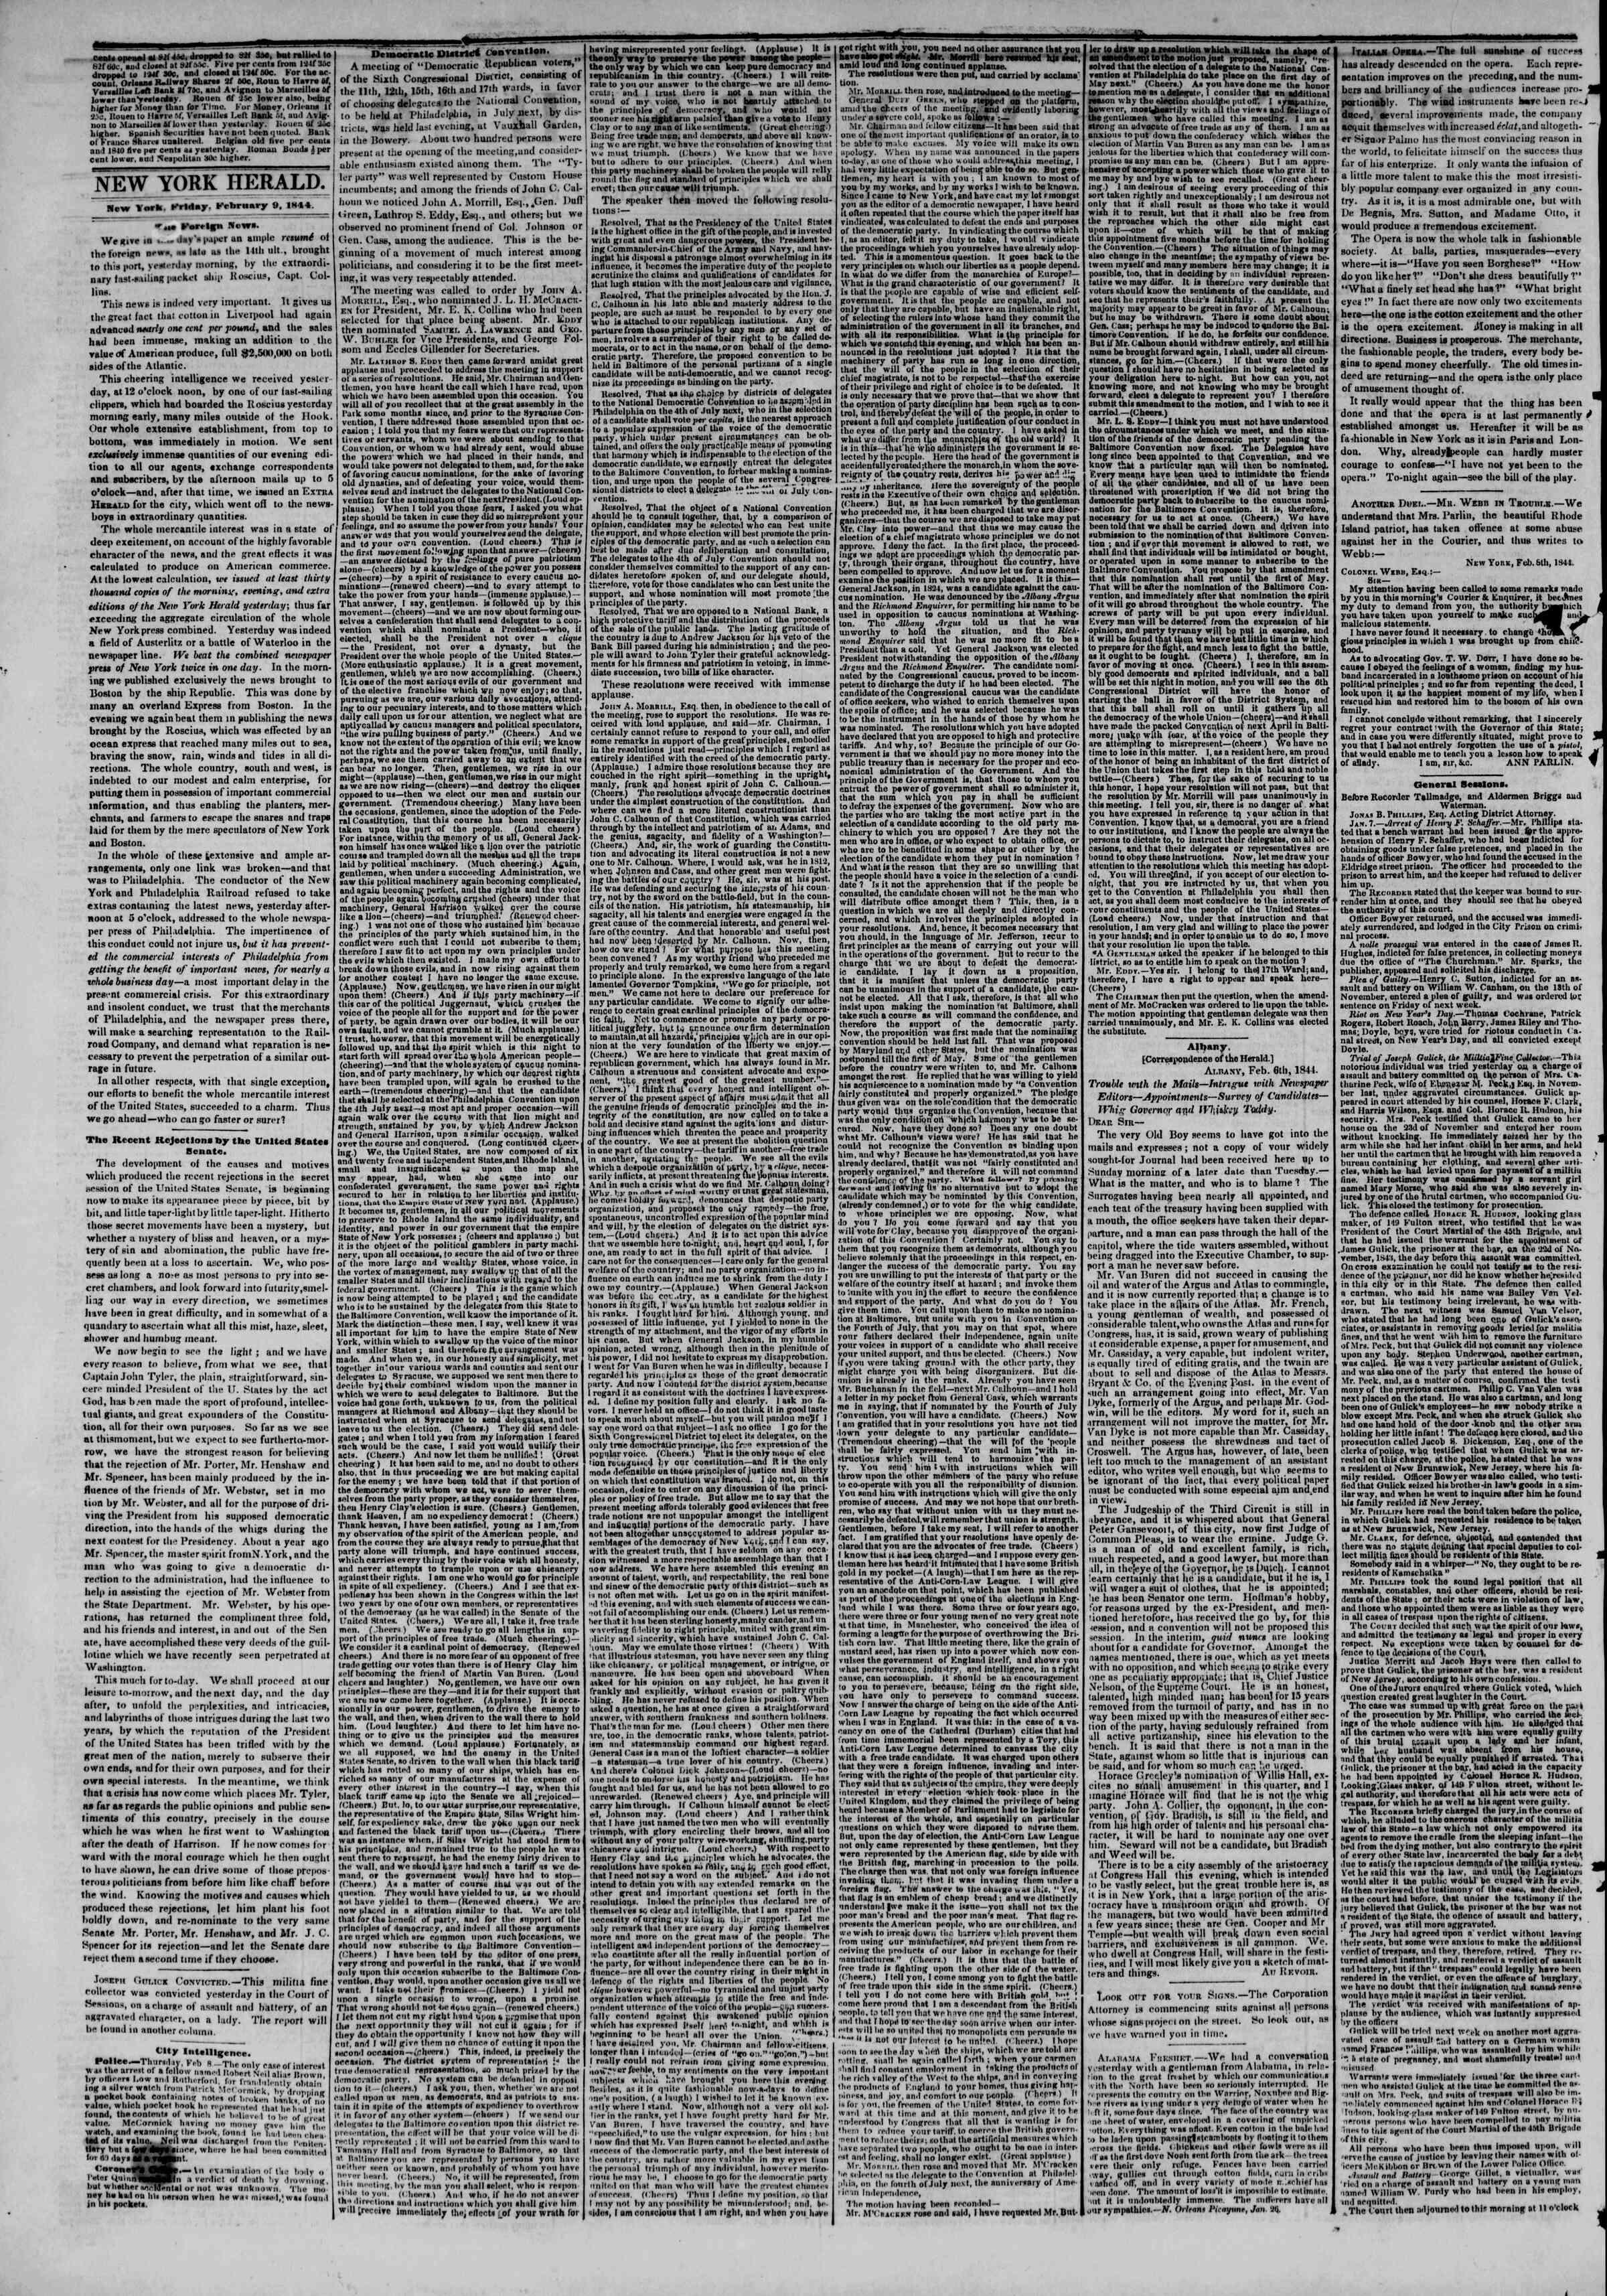 February 9, 1844 Tarihli The New York Herald Gazetesi Sayfa 2